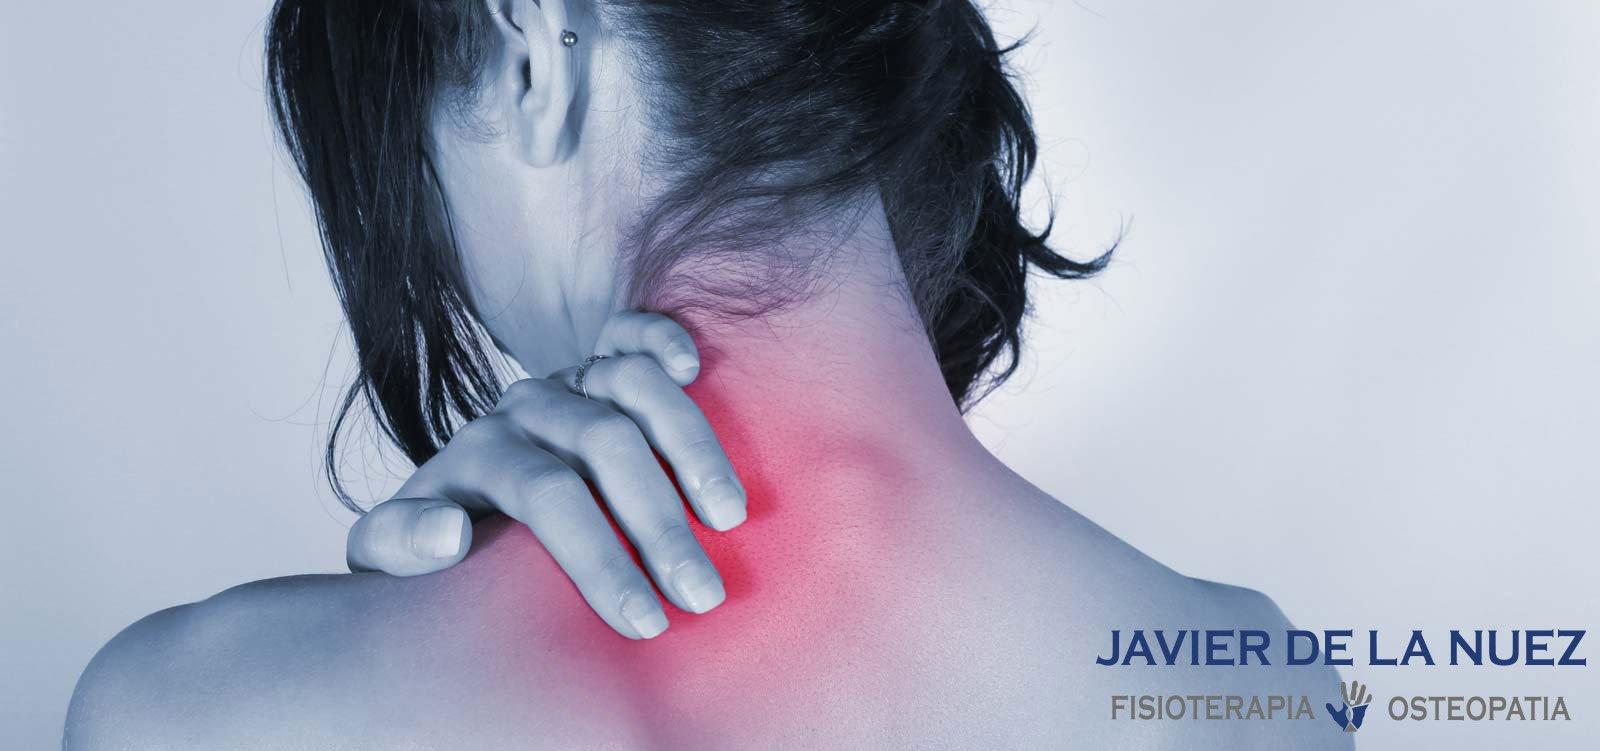 Ejercicios para fortalecer la musculatura cervical